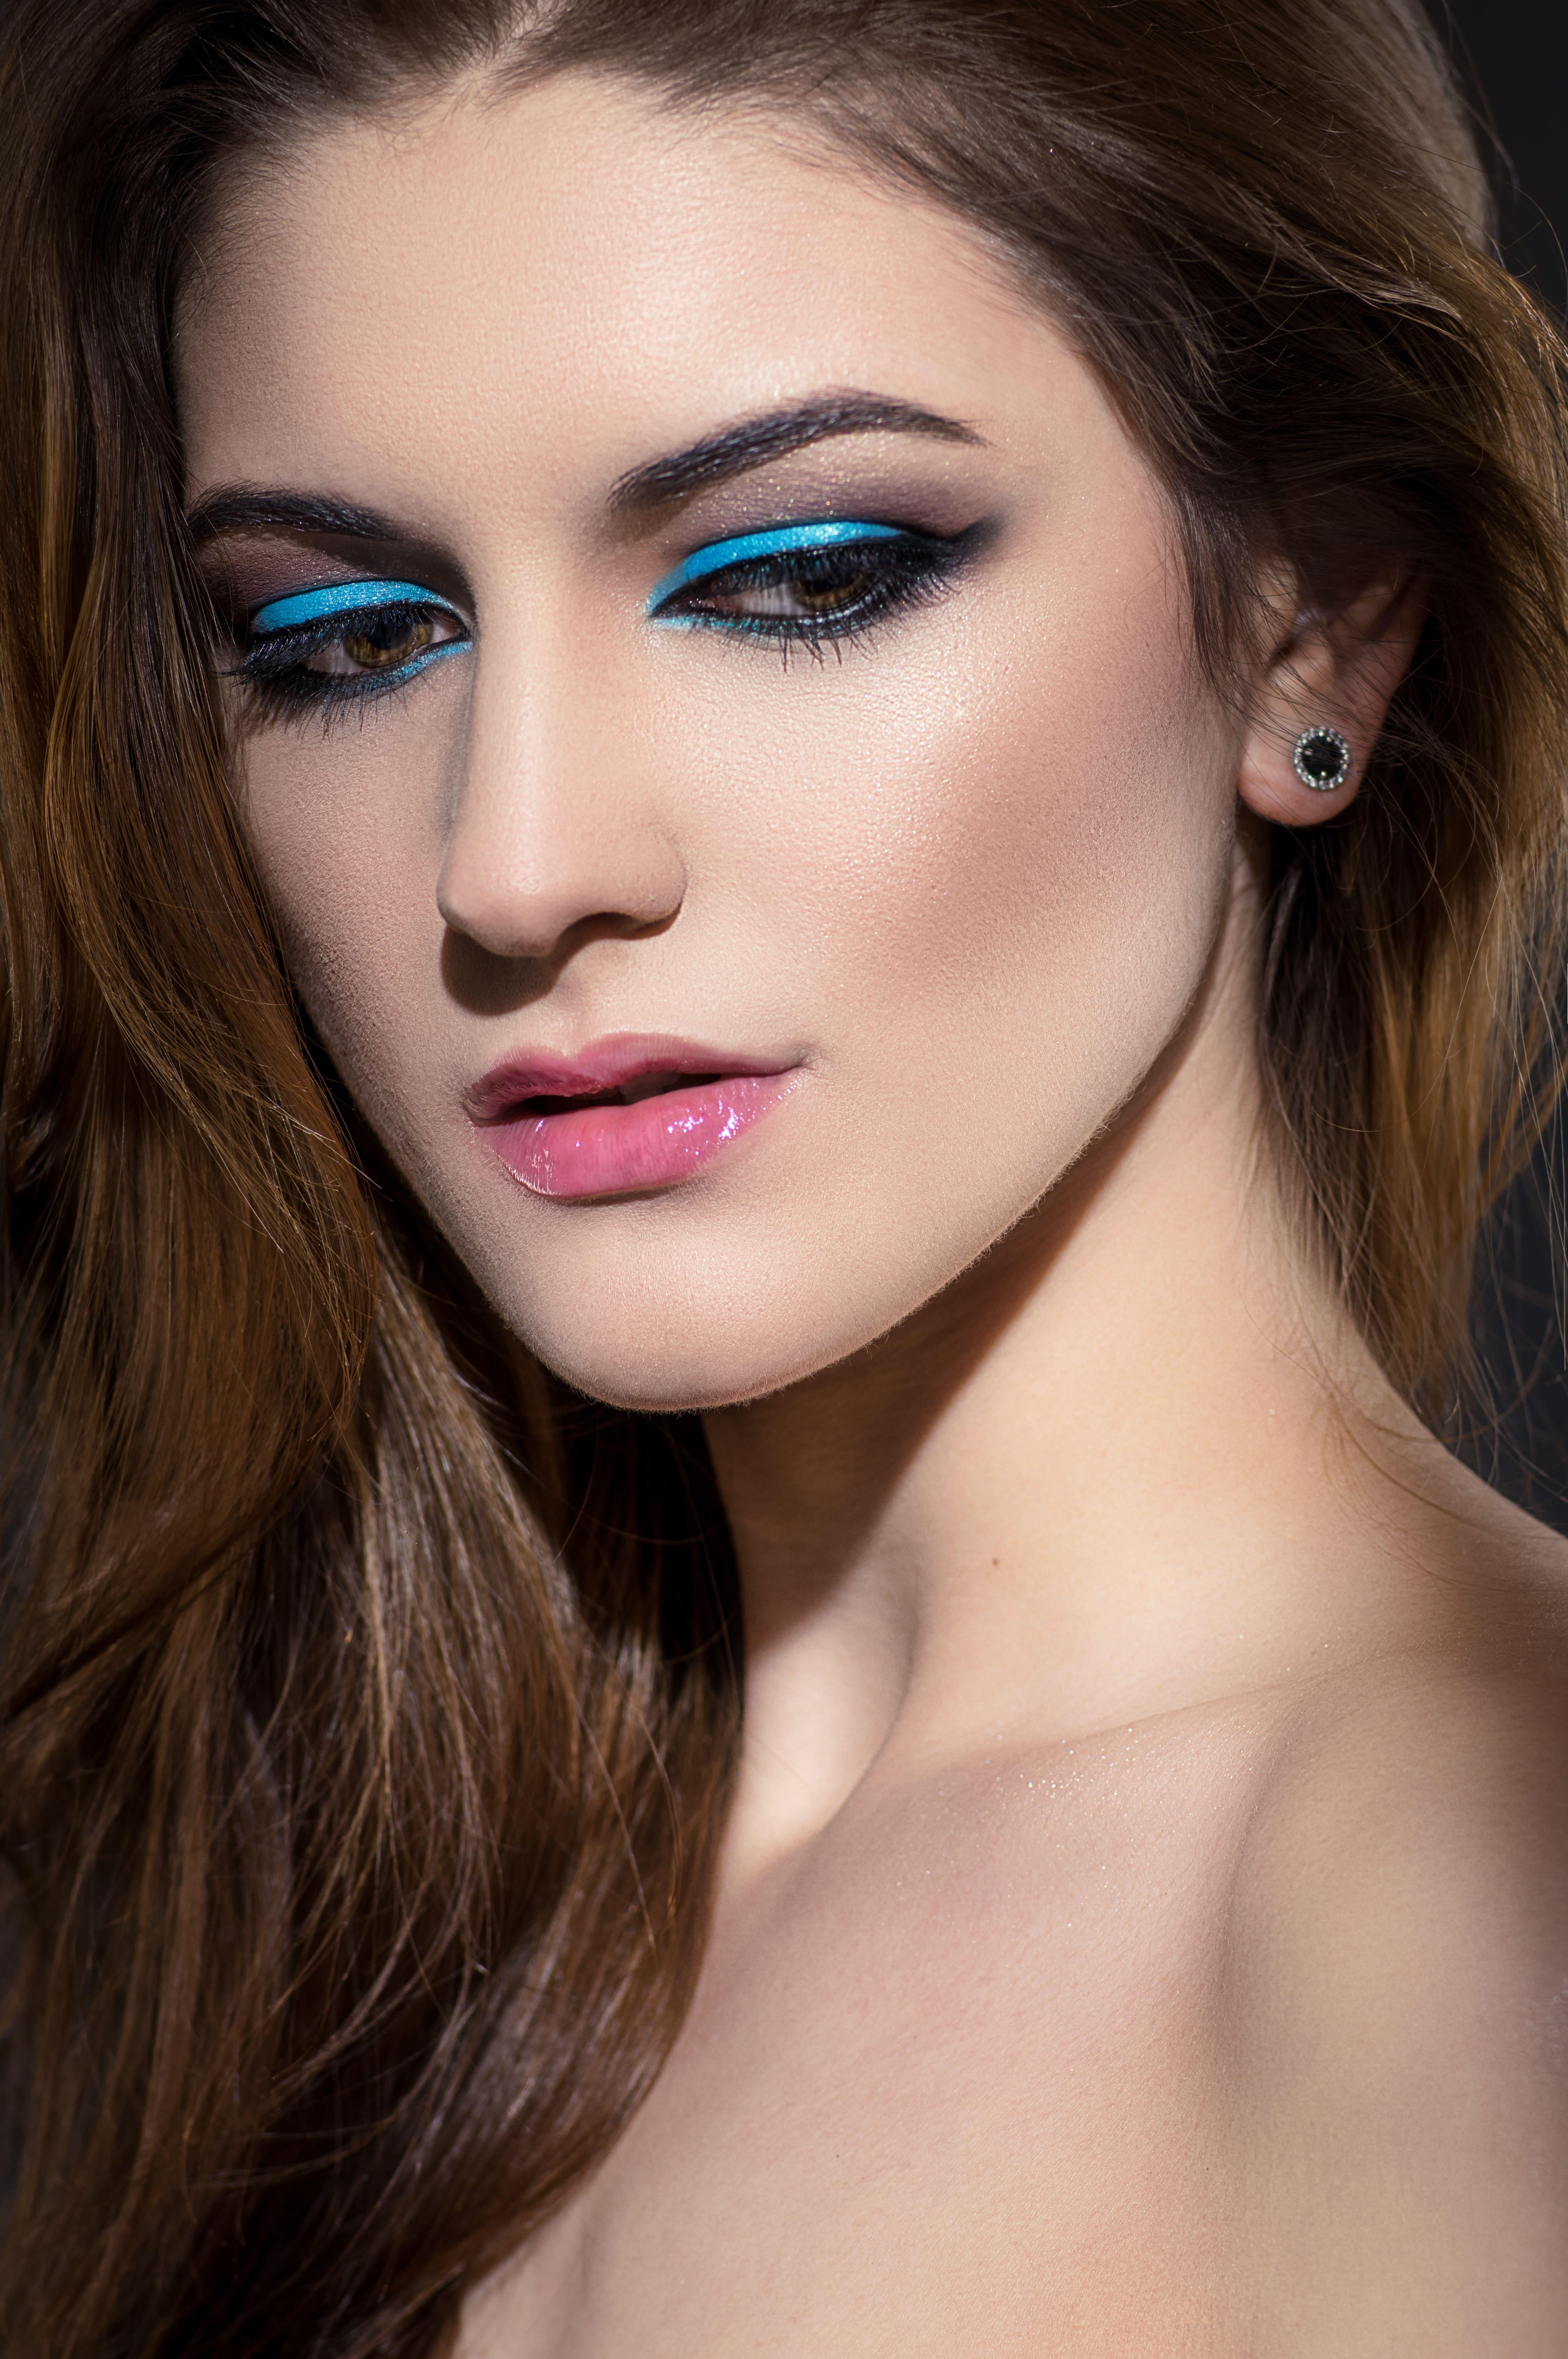 Eyeshadow Looks - 6